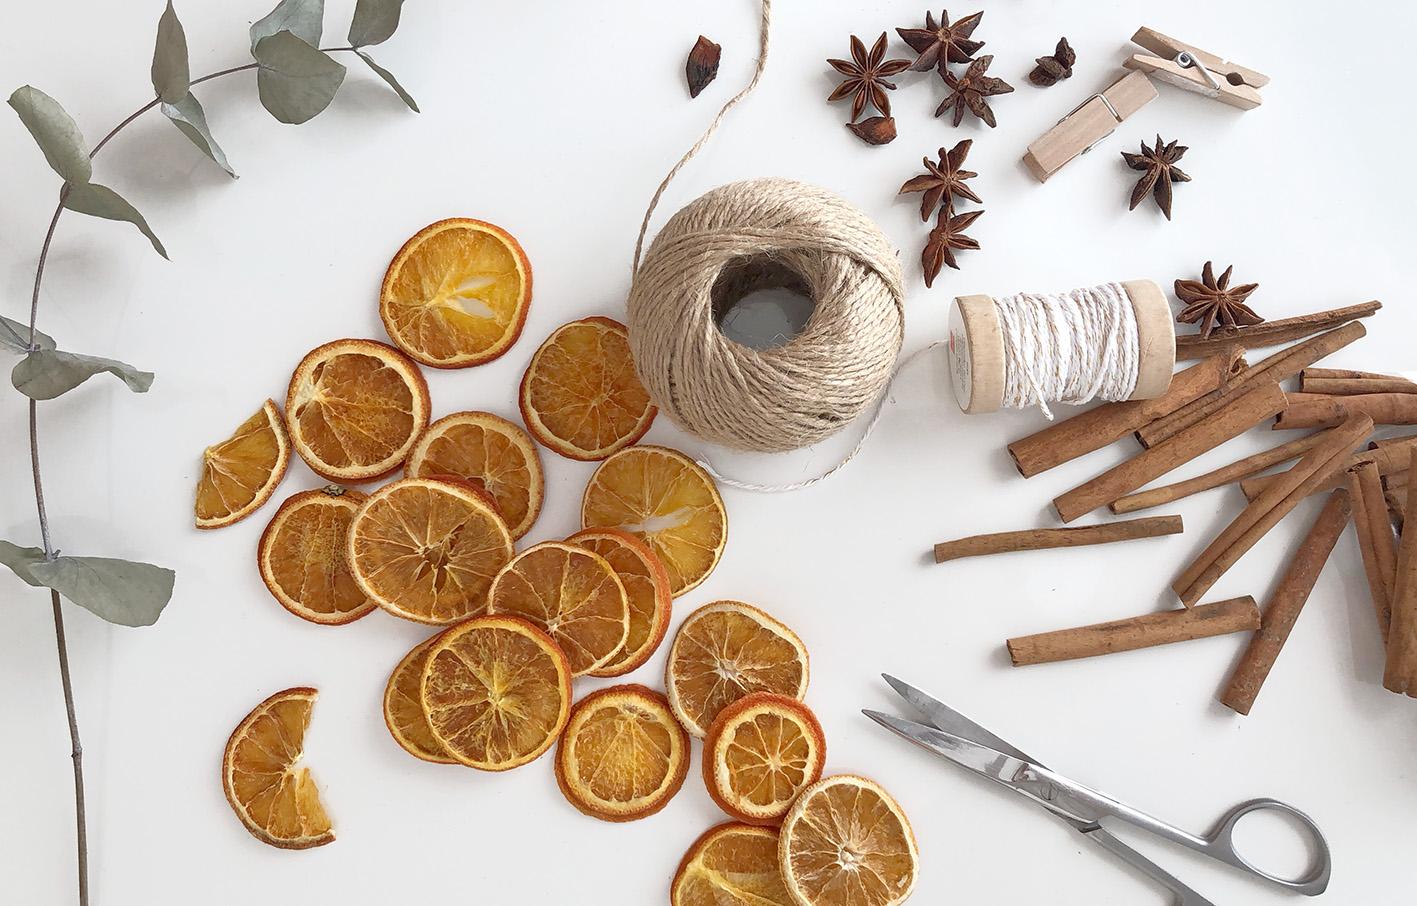 DIY-rondelles-oranges-sechees